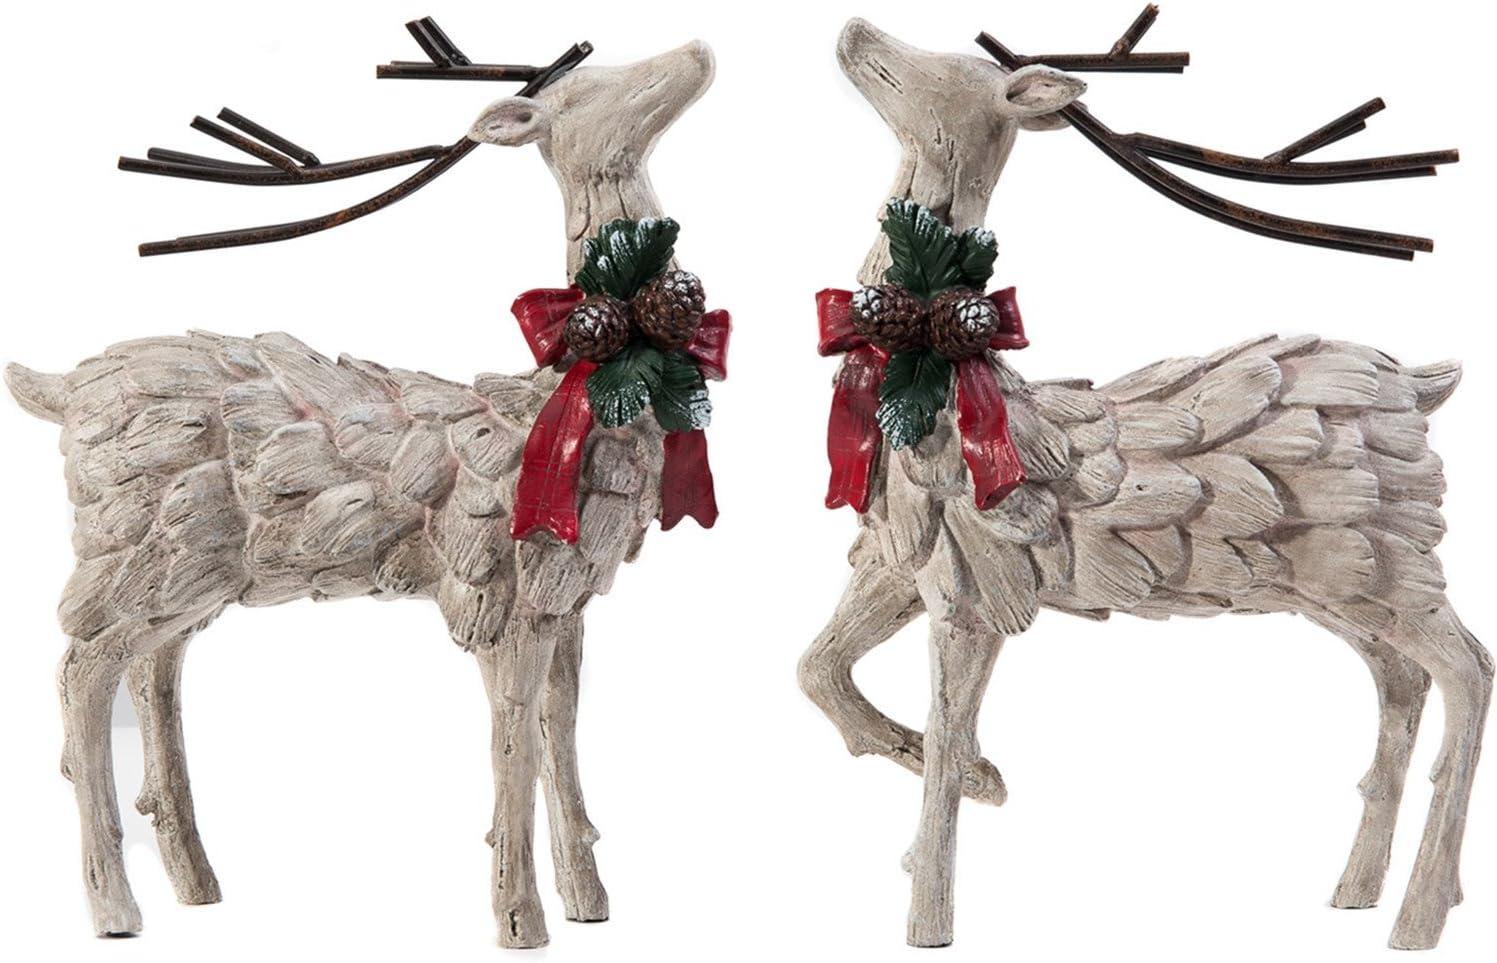 CEDAR HOME Resin Holiday Figurine Decorative Christmas Deer Tabletop Statue Decor, 2 Pack